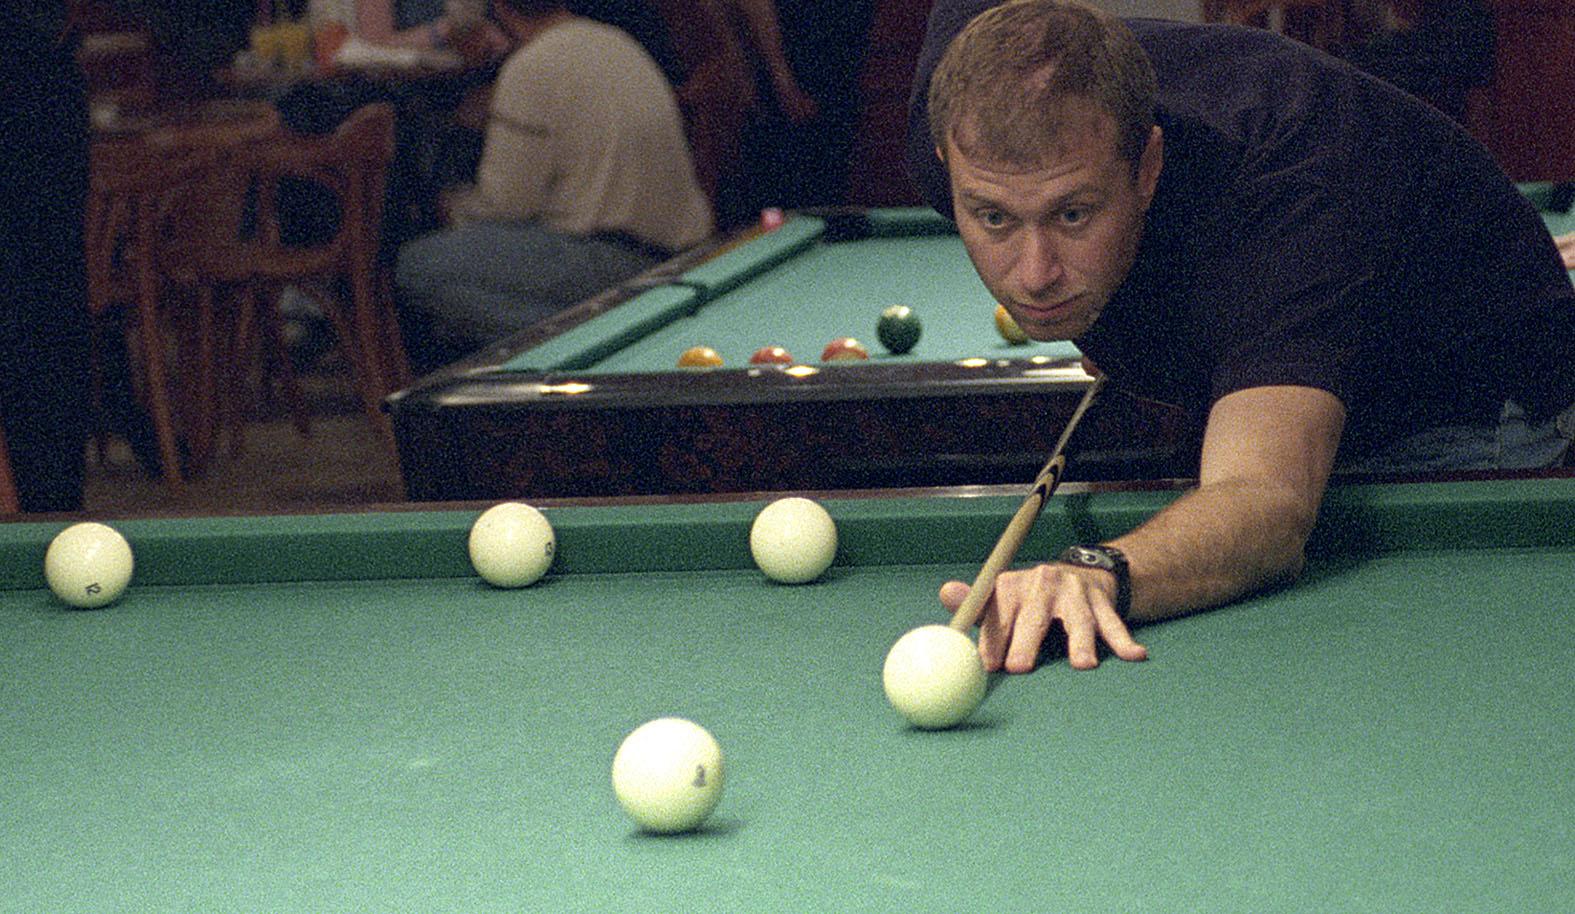 Roman Abramovics 2003-ban #moszkvater